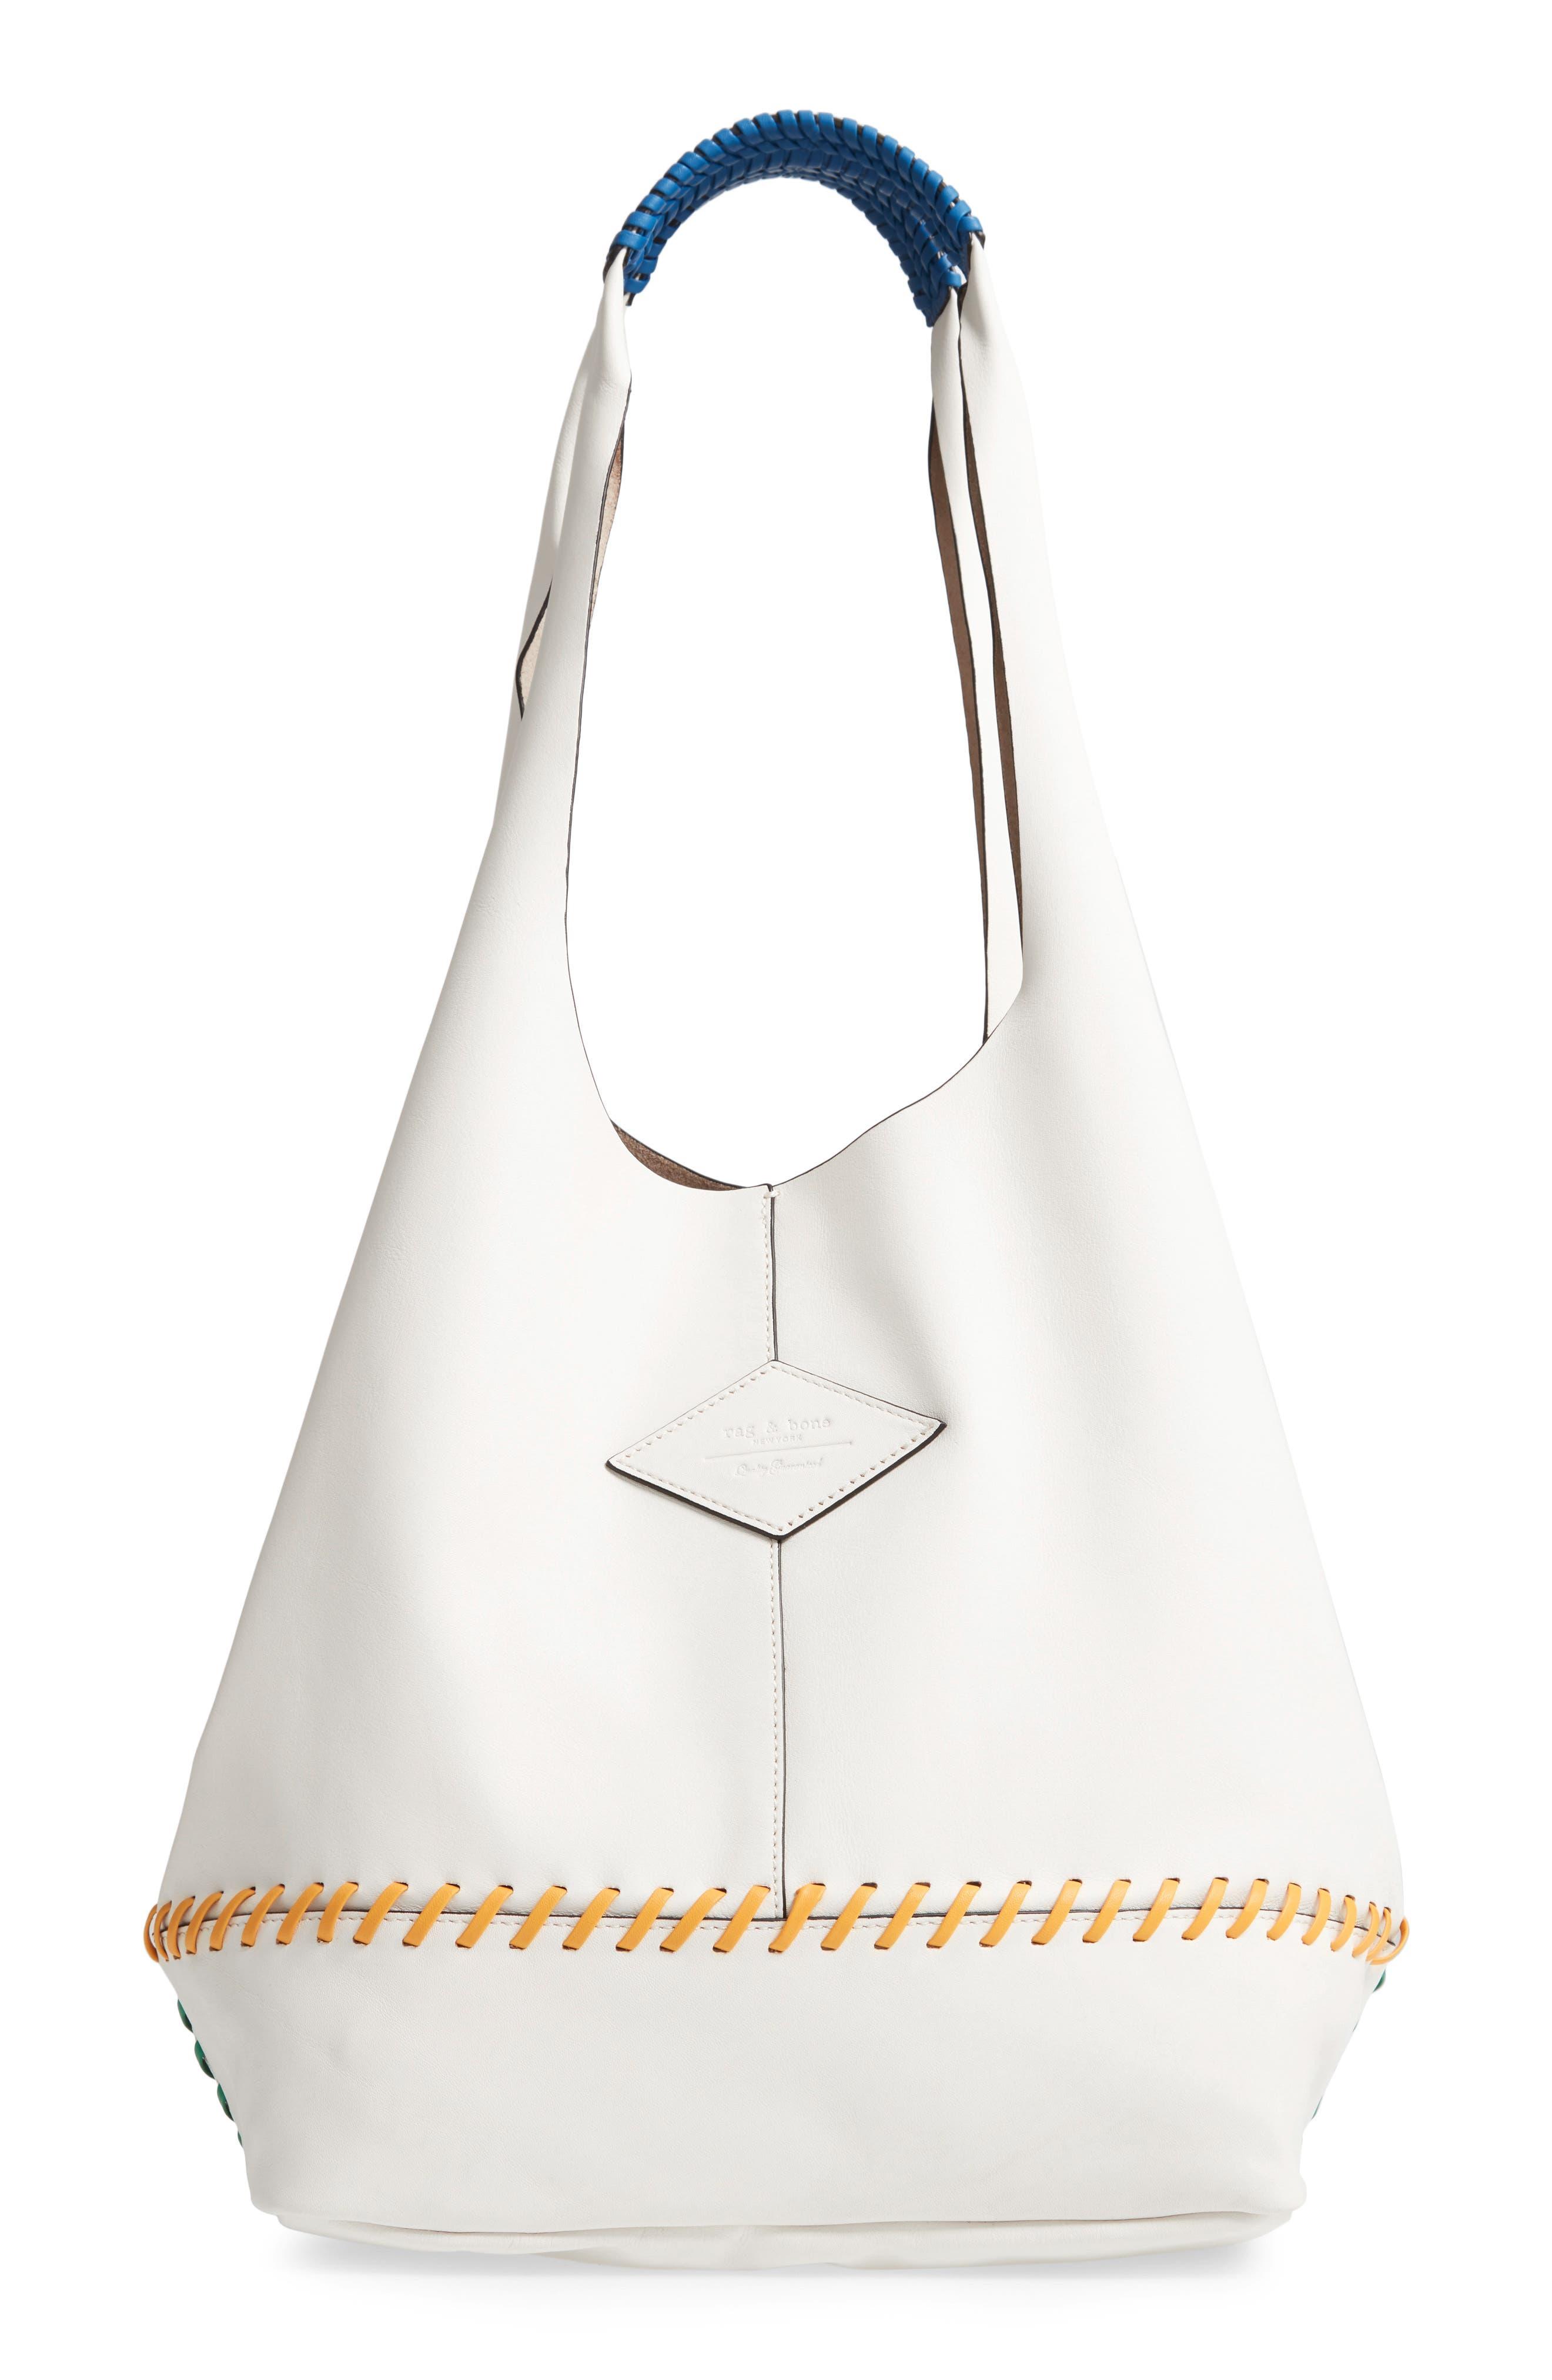 Camden Whipstitch Leather Shopper - White in White Multi